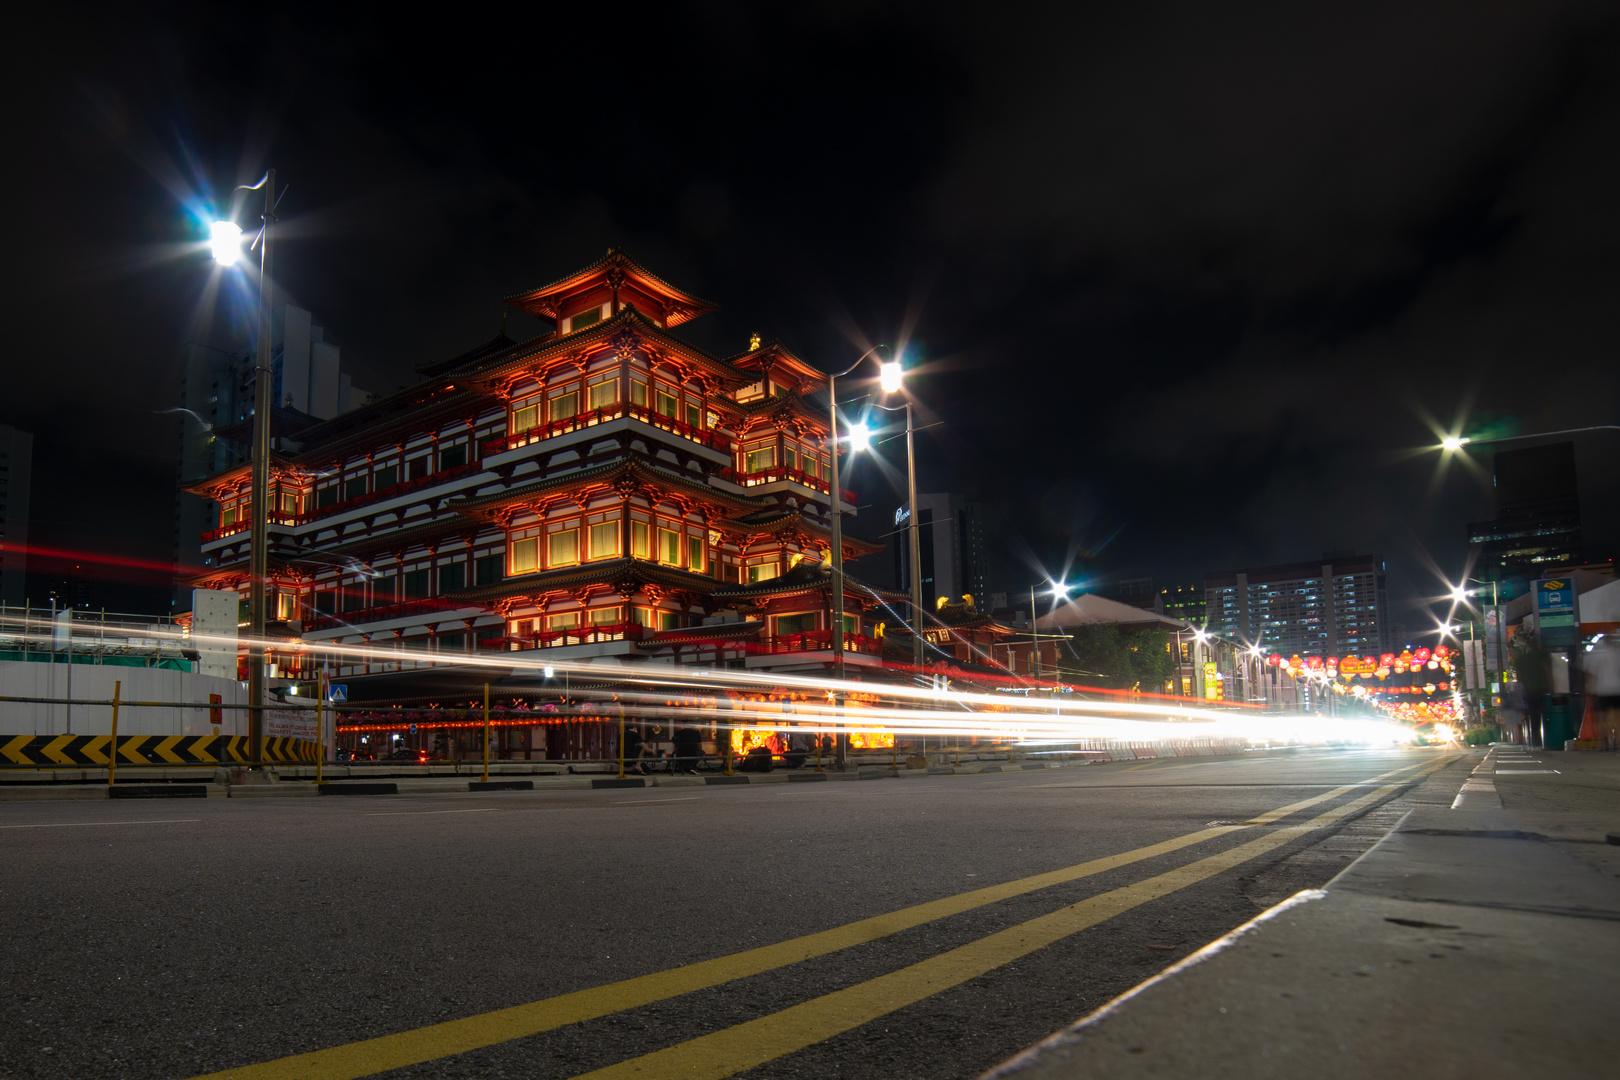 Singapoure Chinatown